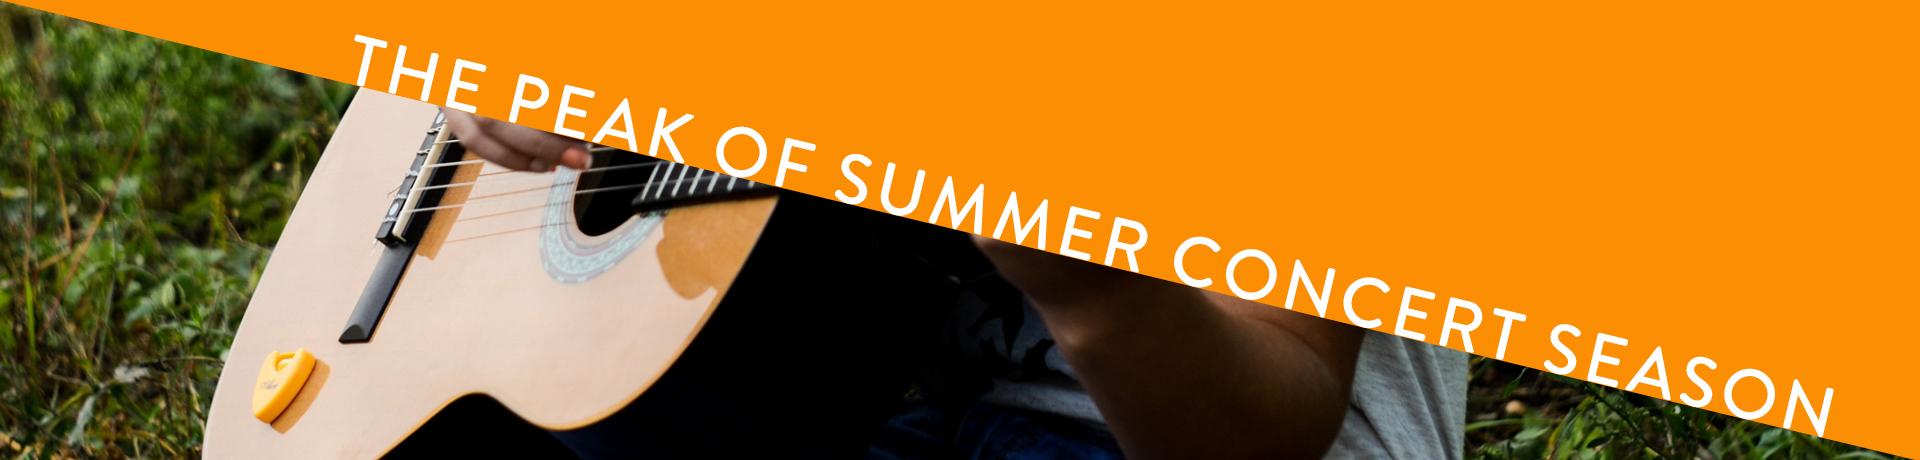 The Peak of Summer Concert Season